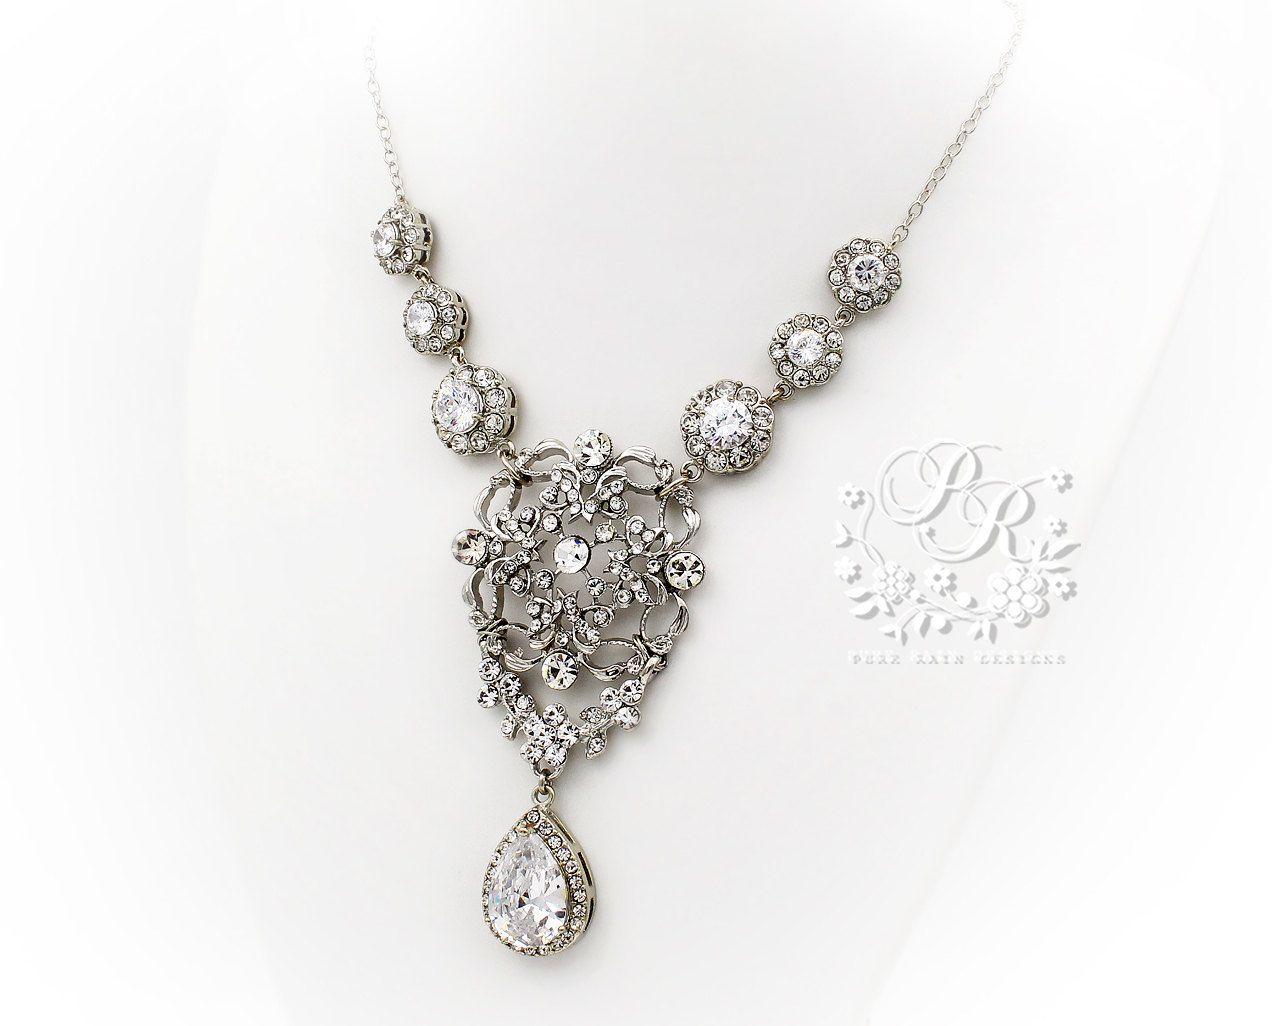 Wedding Necklace Zirconia Pendant  Rhinestone by PureRainDesigns